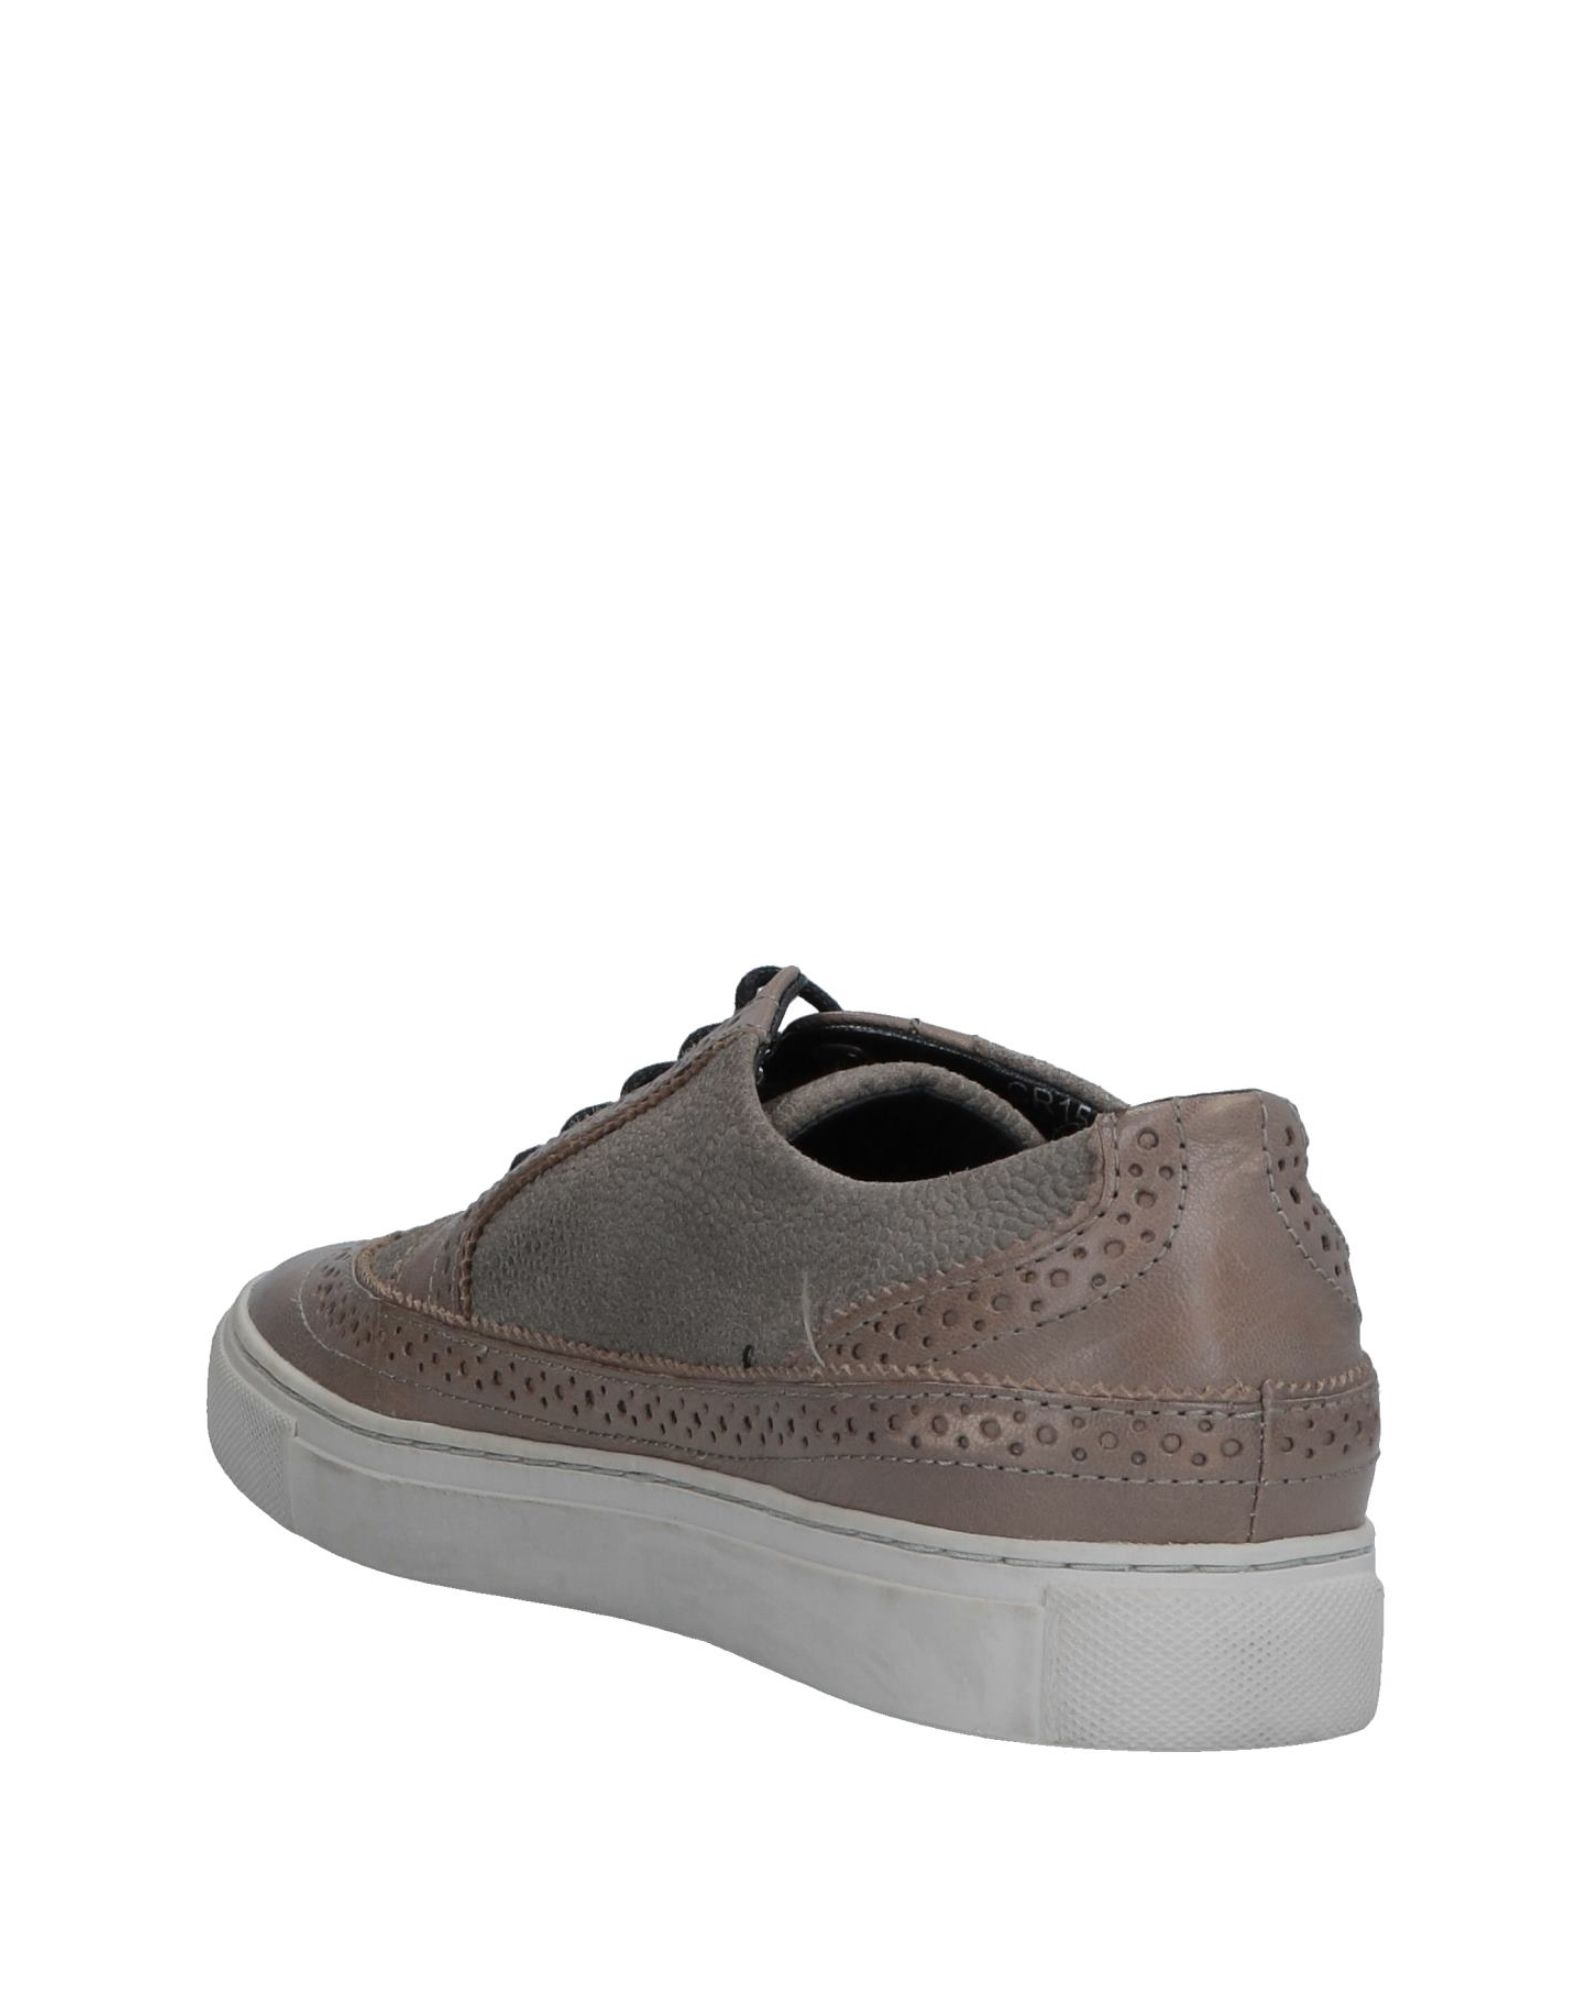 Crime Crime Crime London Sneakers Herren Gutes Preis-Leistungs-Verhältnis, es lohnt sich b3c69f